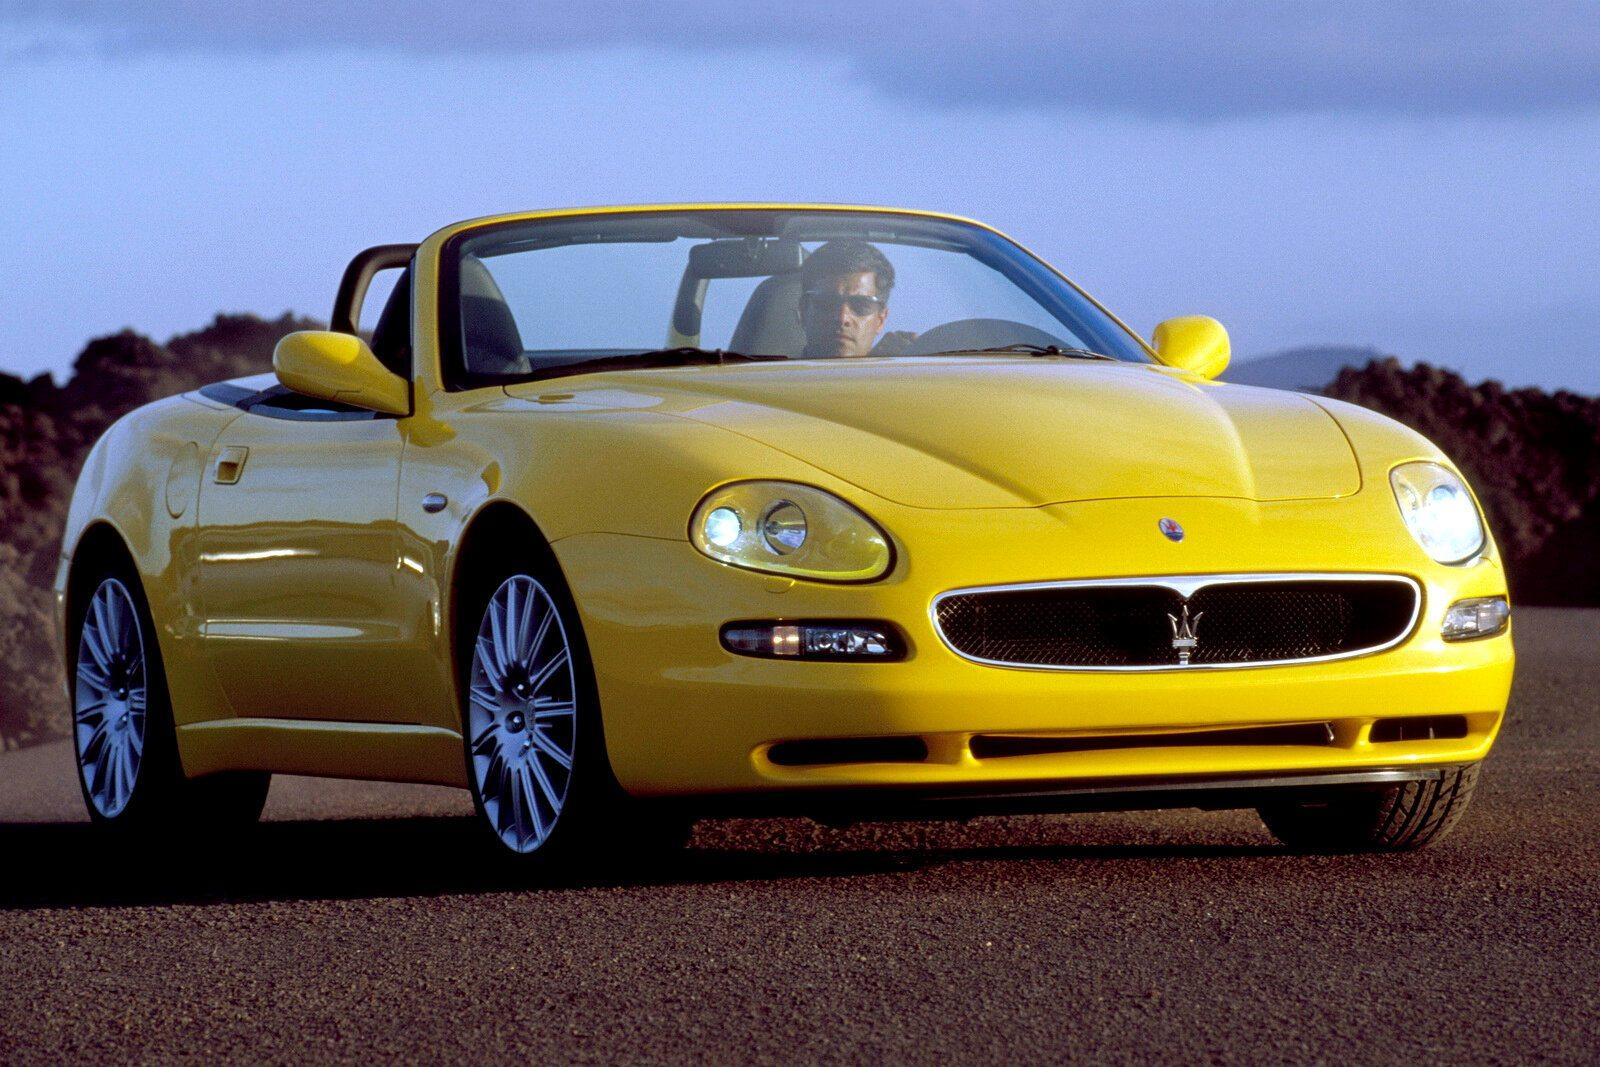 Coche del día: Maserati Spyder GT